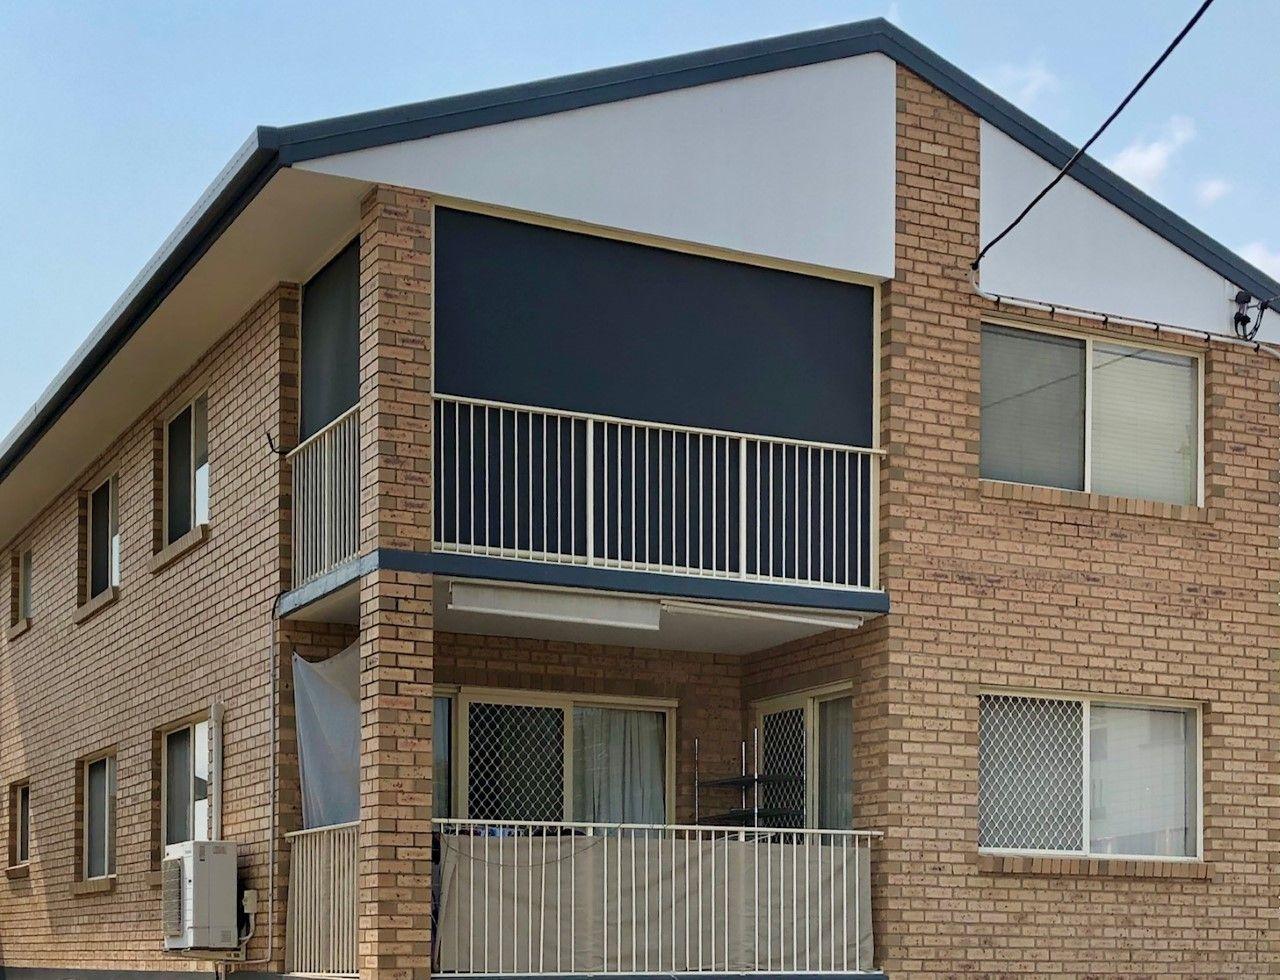 4/73 Kirkland Ave, Coorparoo QLD 4151, Image 0